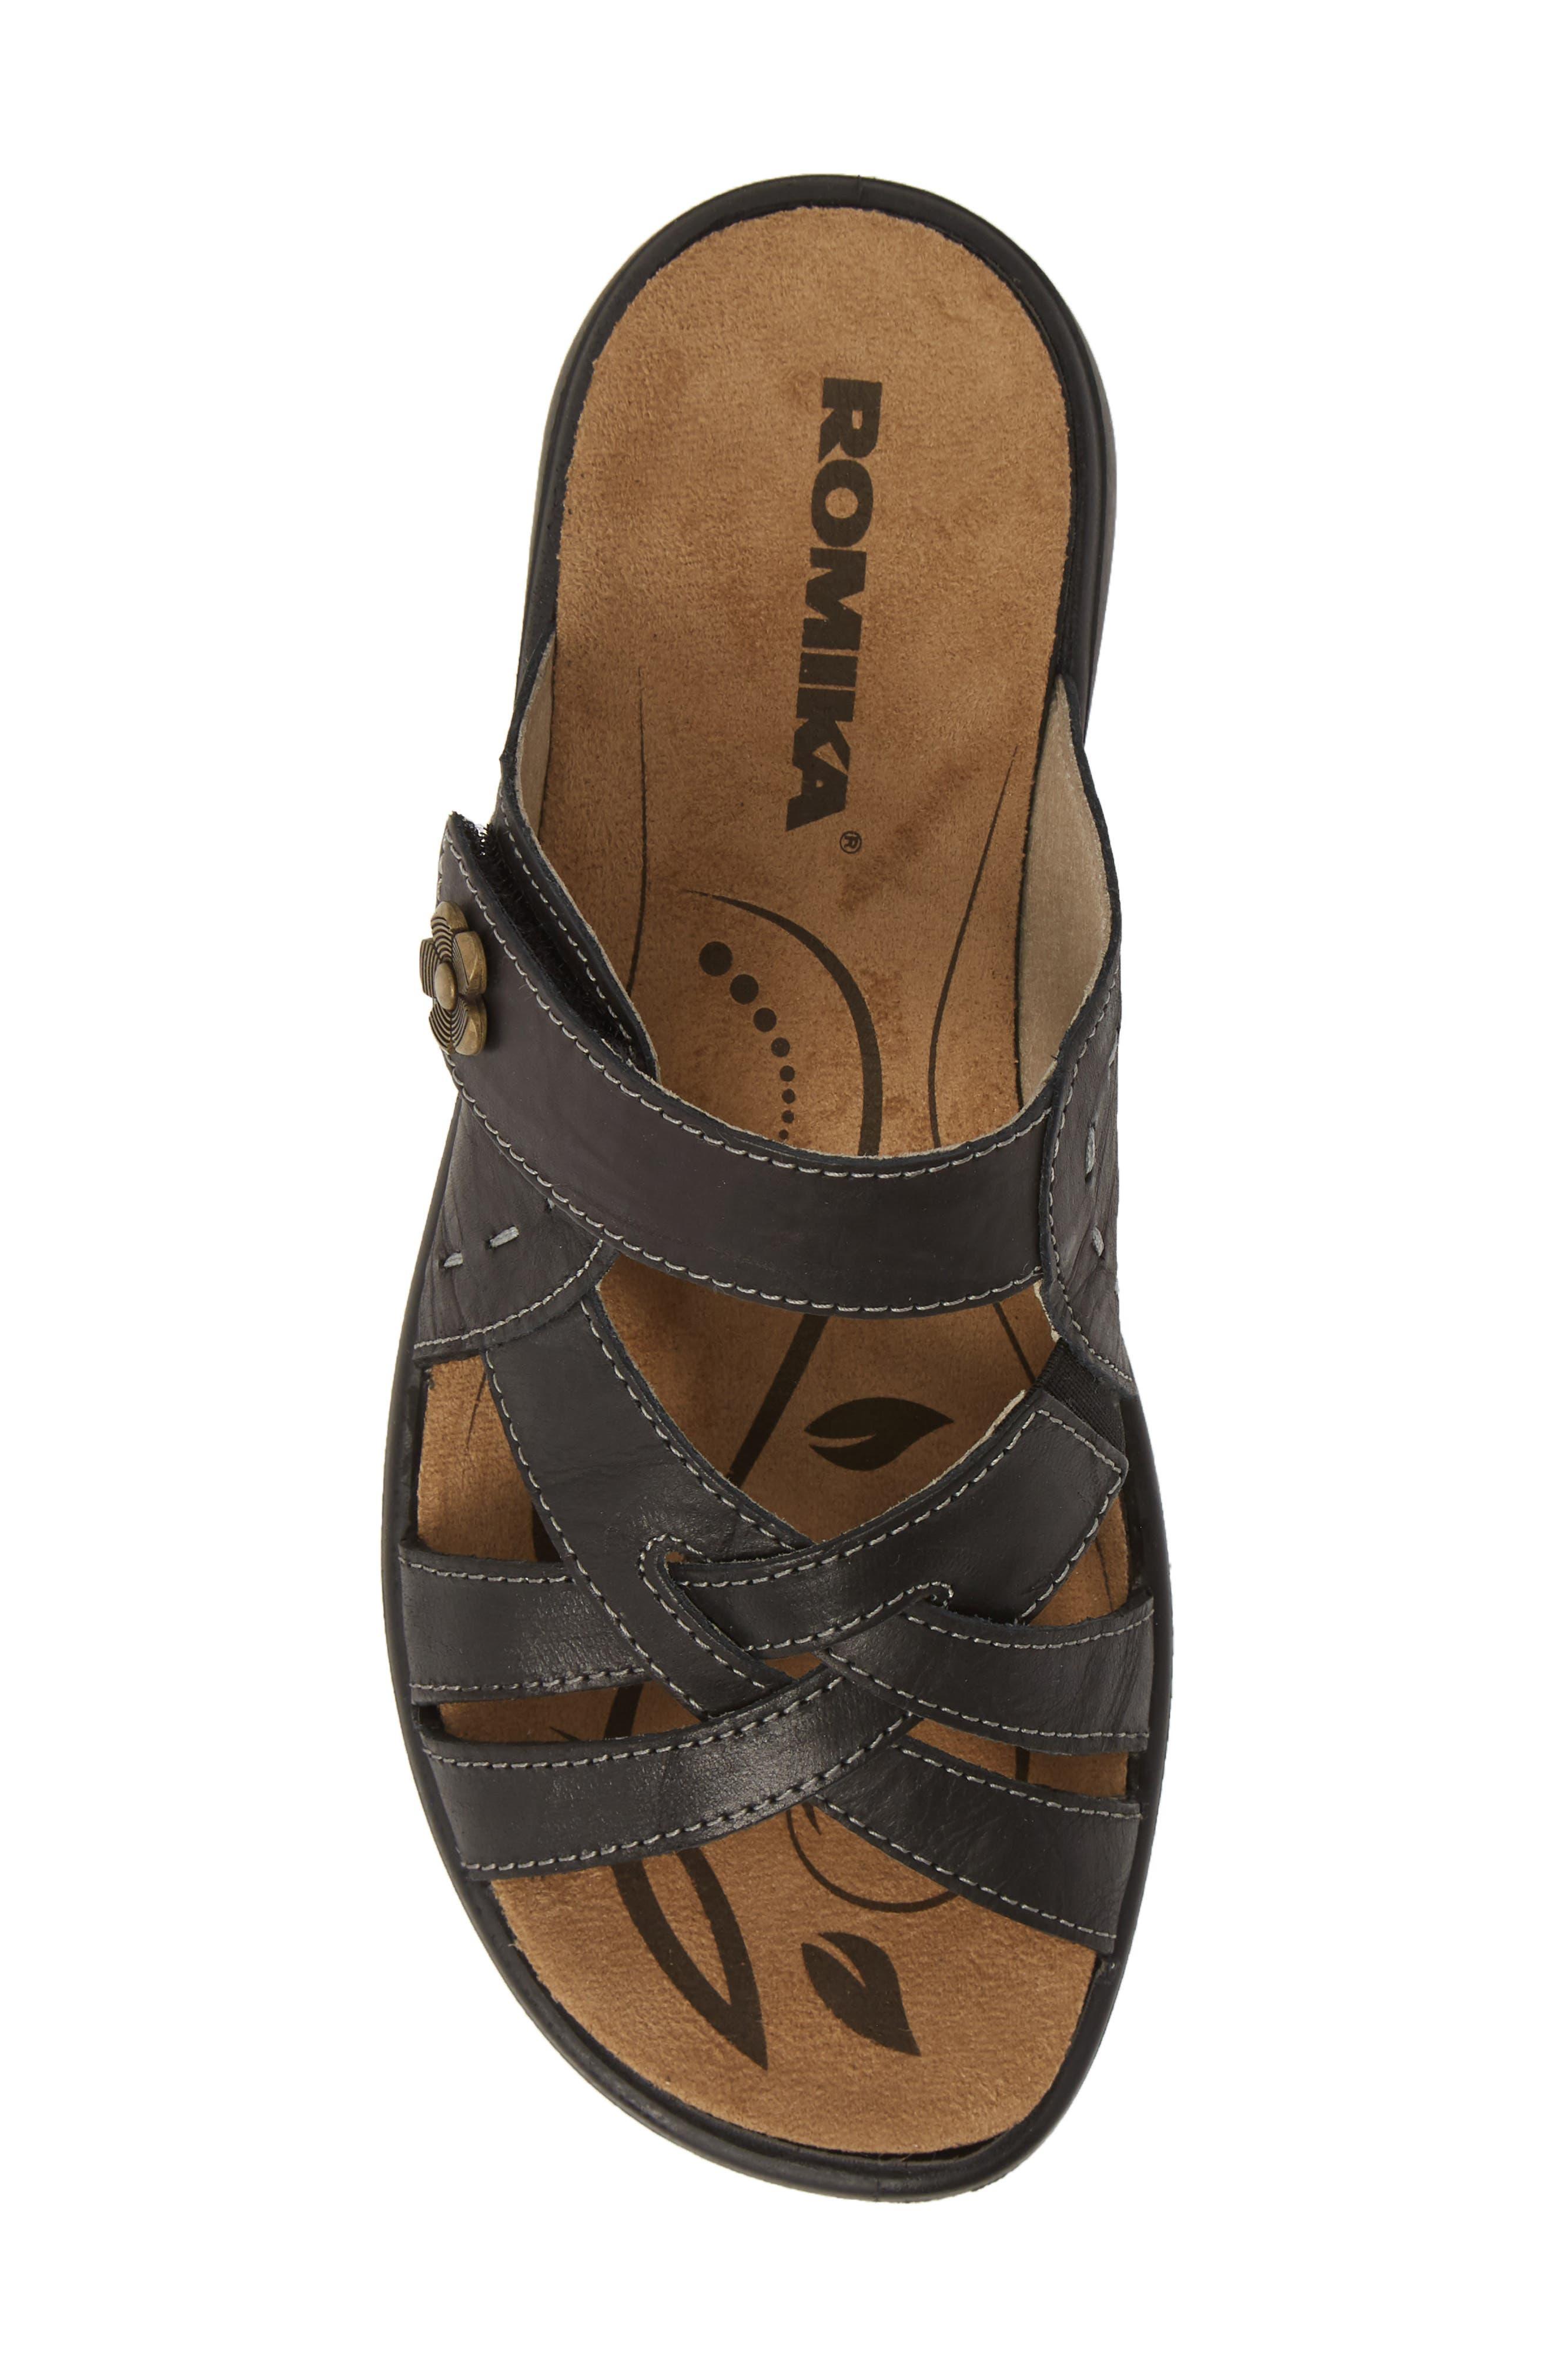 ROMIKA<SUP>®</SUP>, Ibiza 99 Slide Sandal, Alternate thumbnail 5, color, BLACK LEATHER